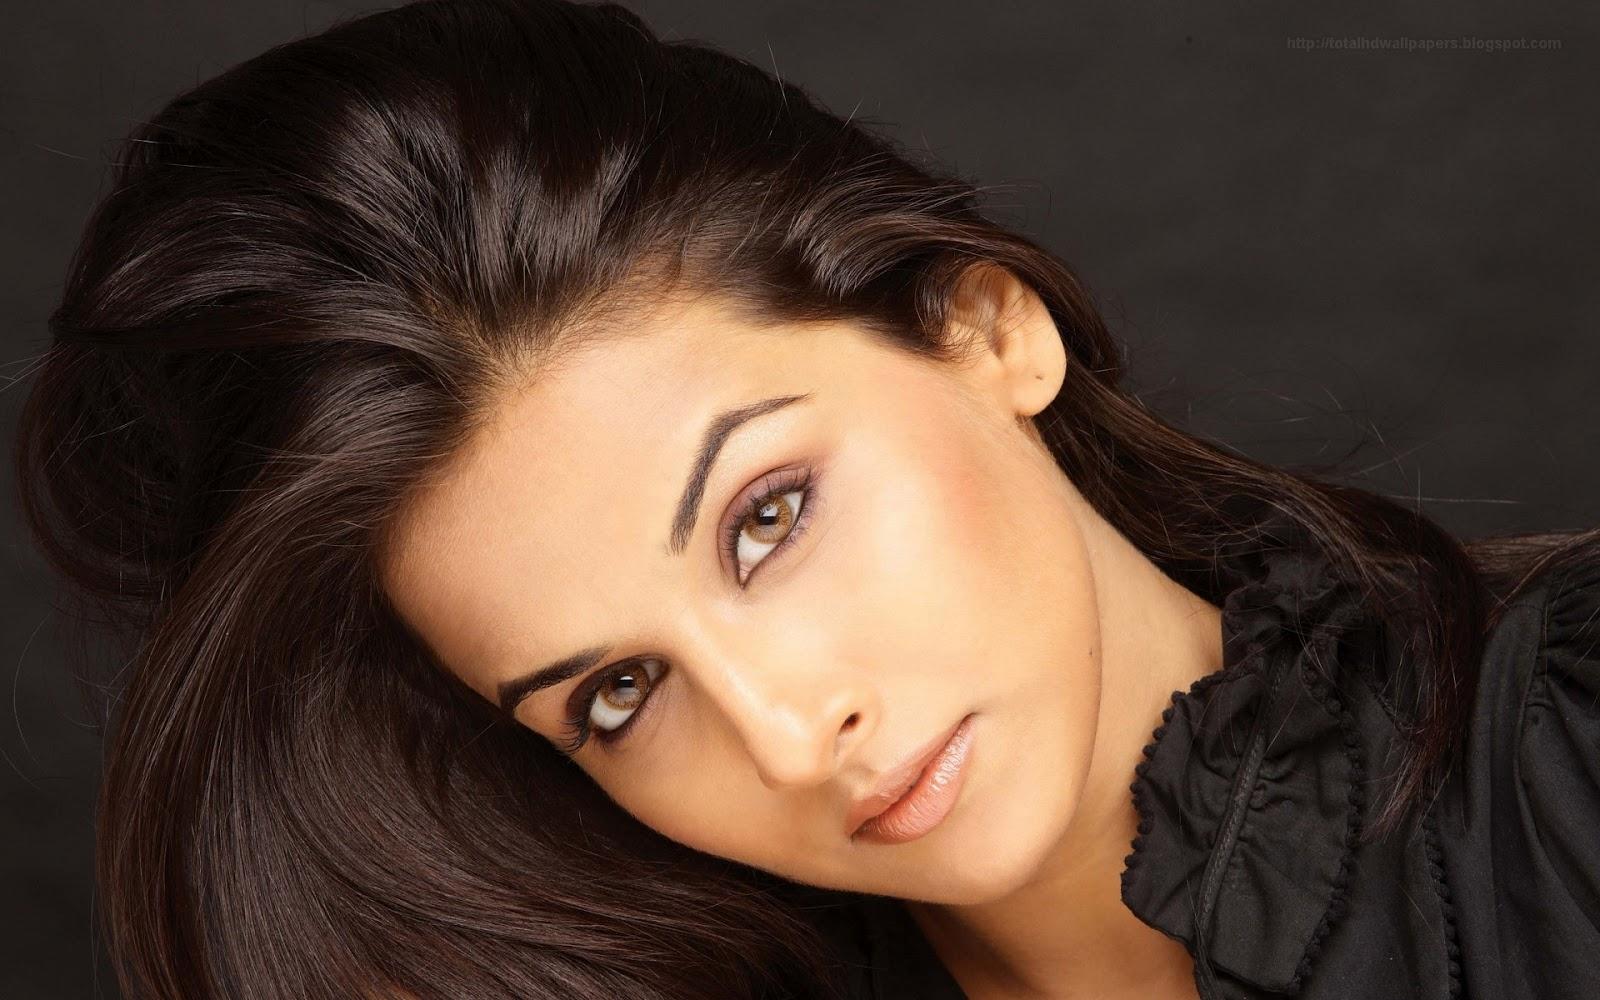 Beautiful Bollywood Actress Vidya Balan Full Hd Hq Wallpapers5 Copy Bollywood Journalist